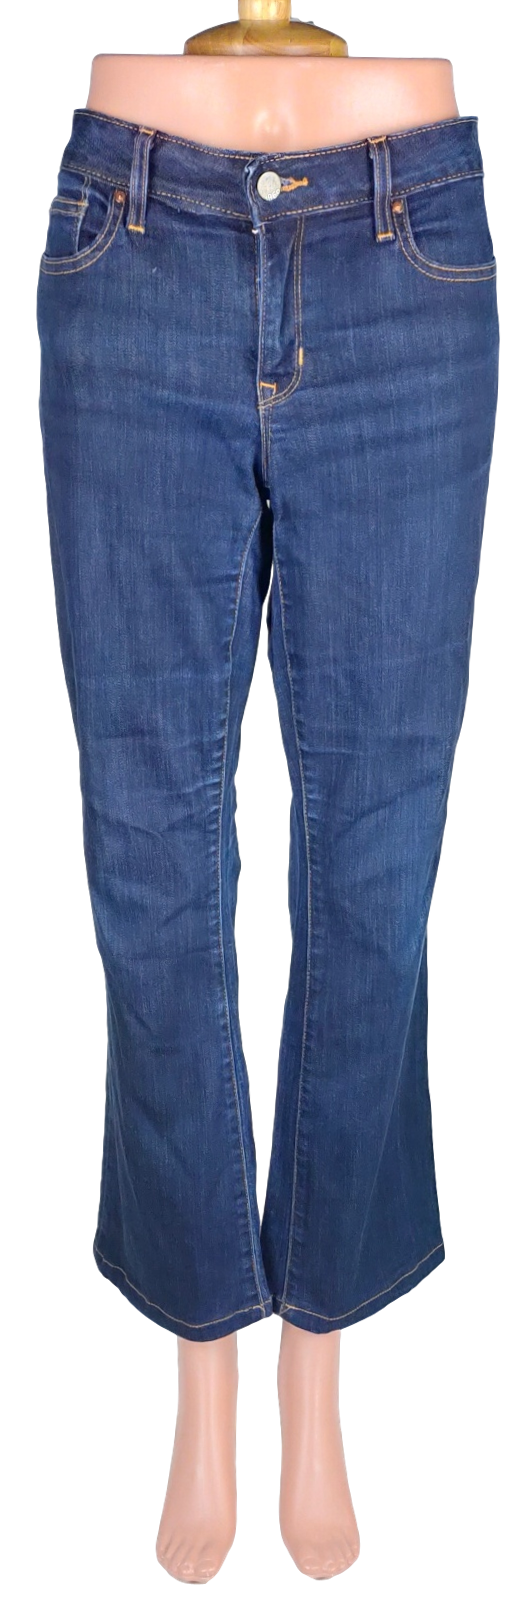 Jean Gap -Taille 40